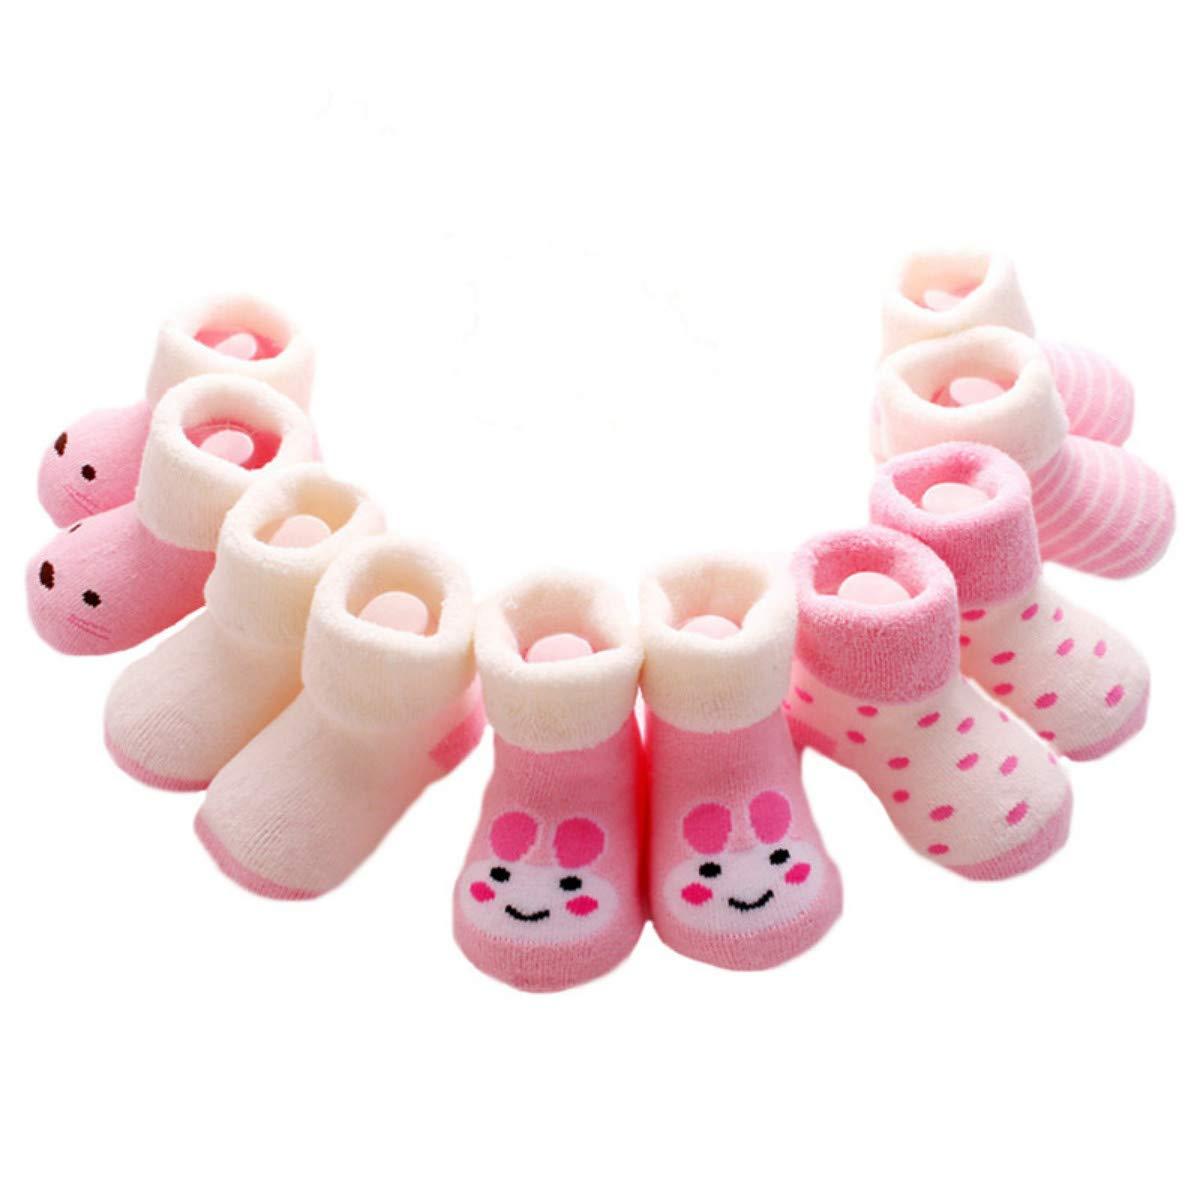 5Pairs//lot Infant Baby Boy Socks Cartoon Striped Baby Girl Socks Newborn Winter Warm Terry Socks for Newborns Baby